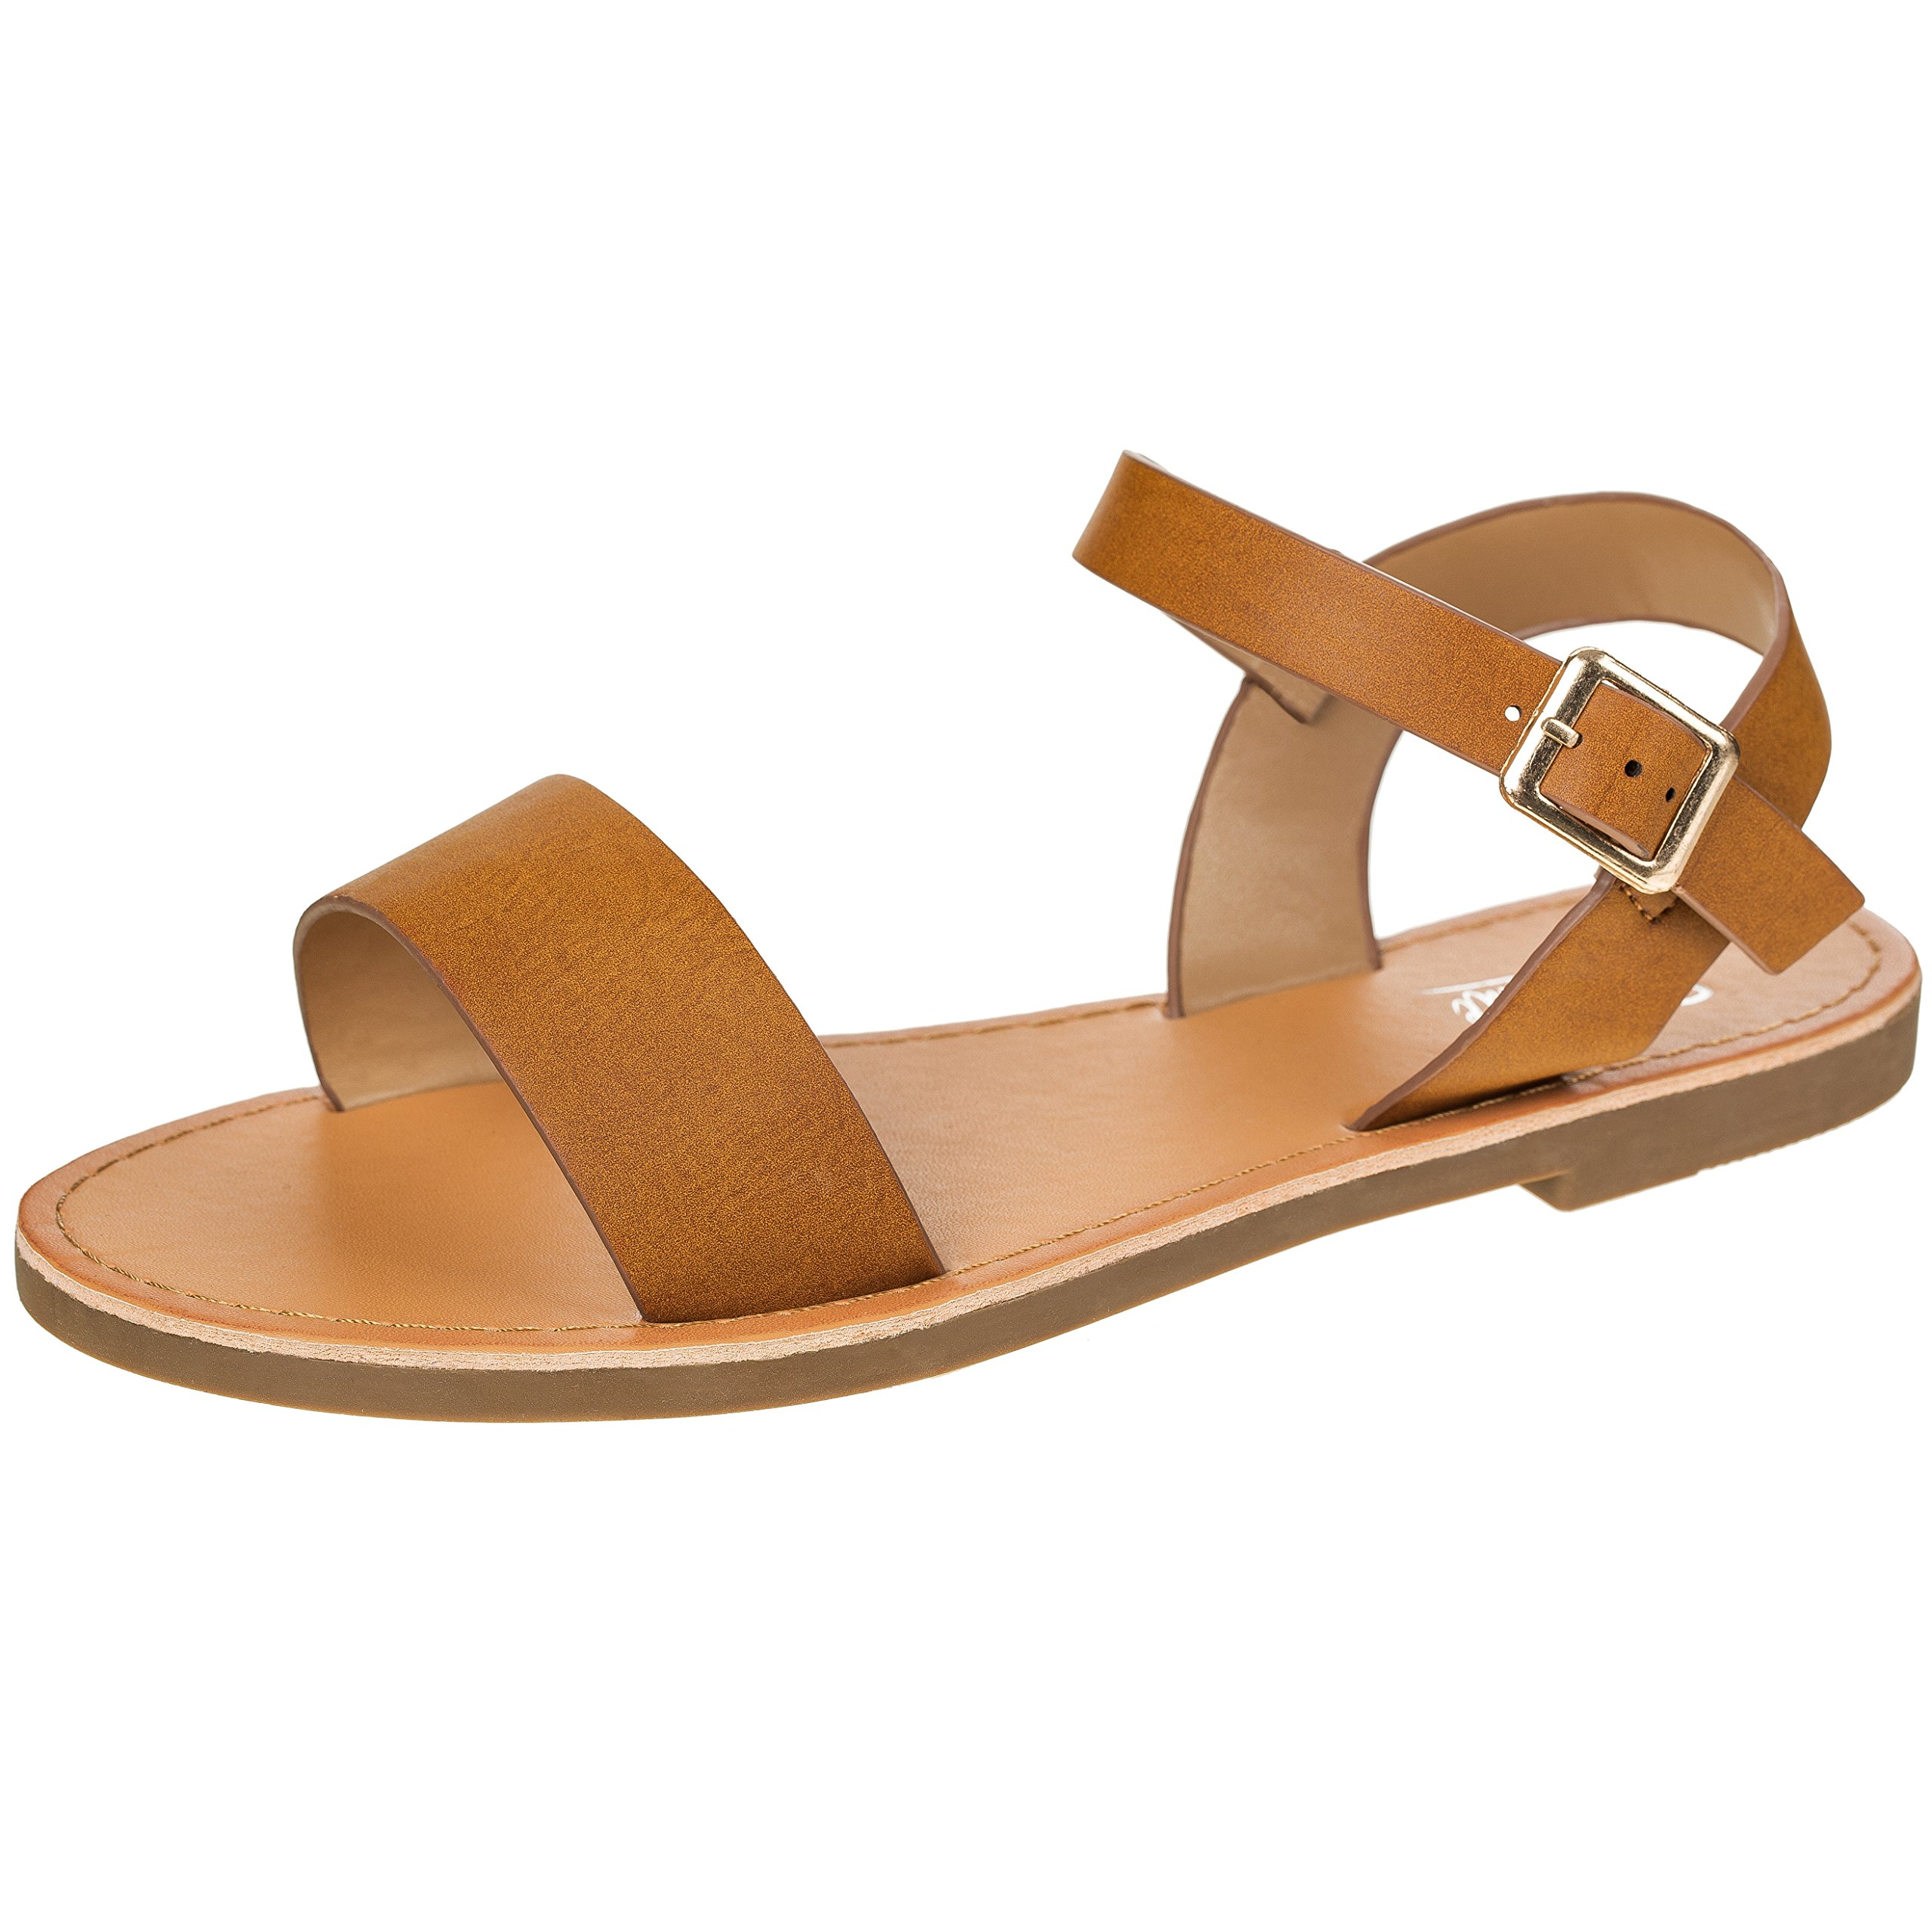 Women's Shoe Comfort Simple Basic Ankle Strap Flat Sandals (10, Chestnut)